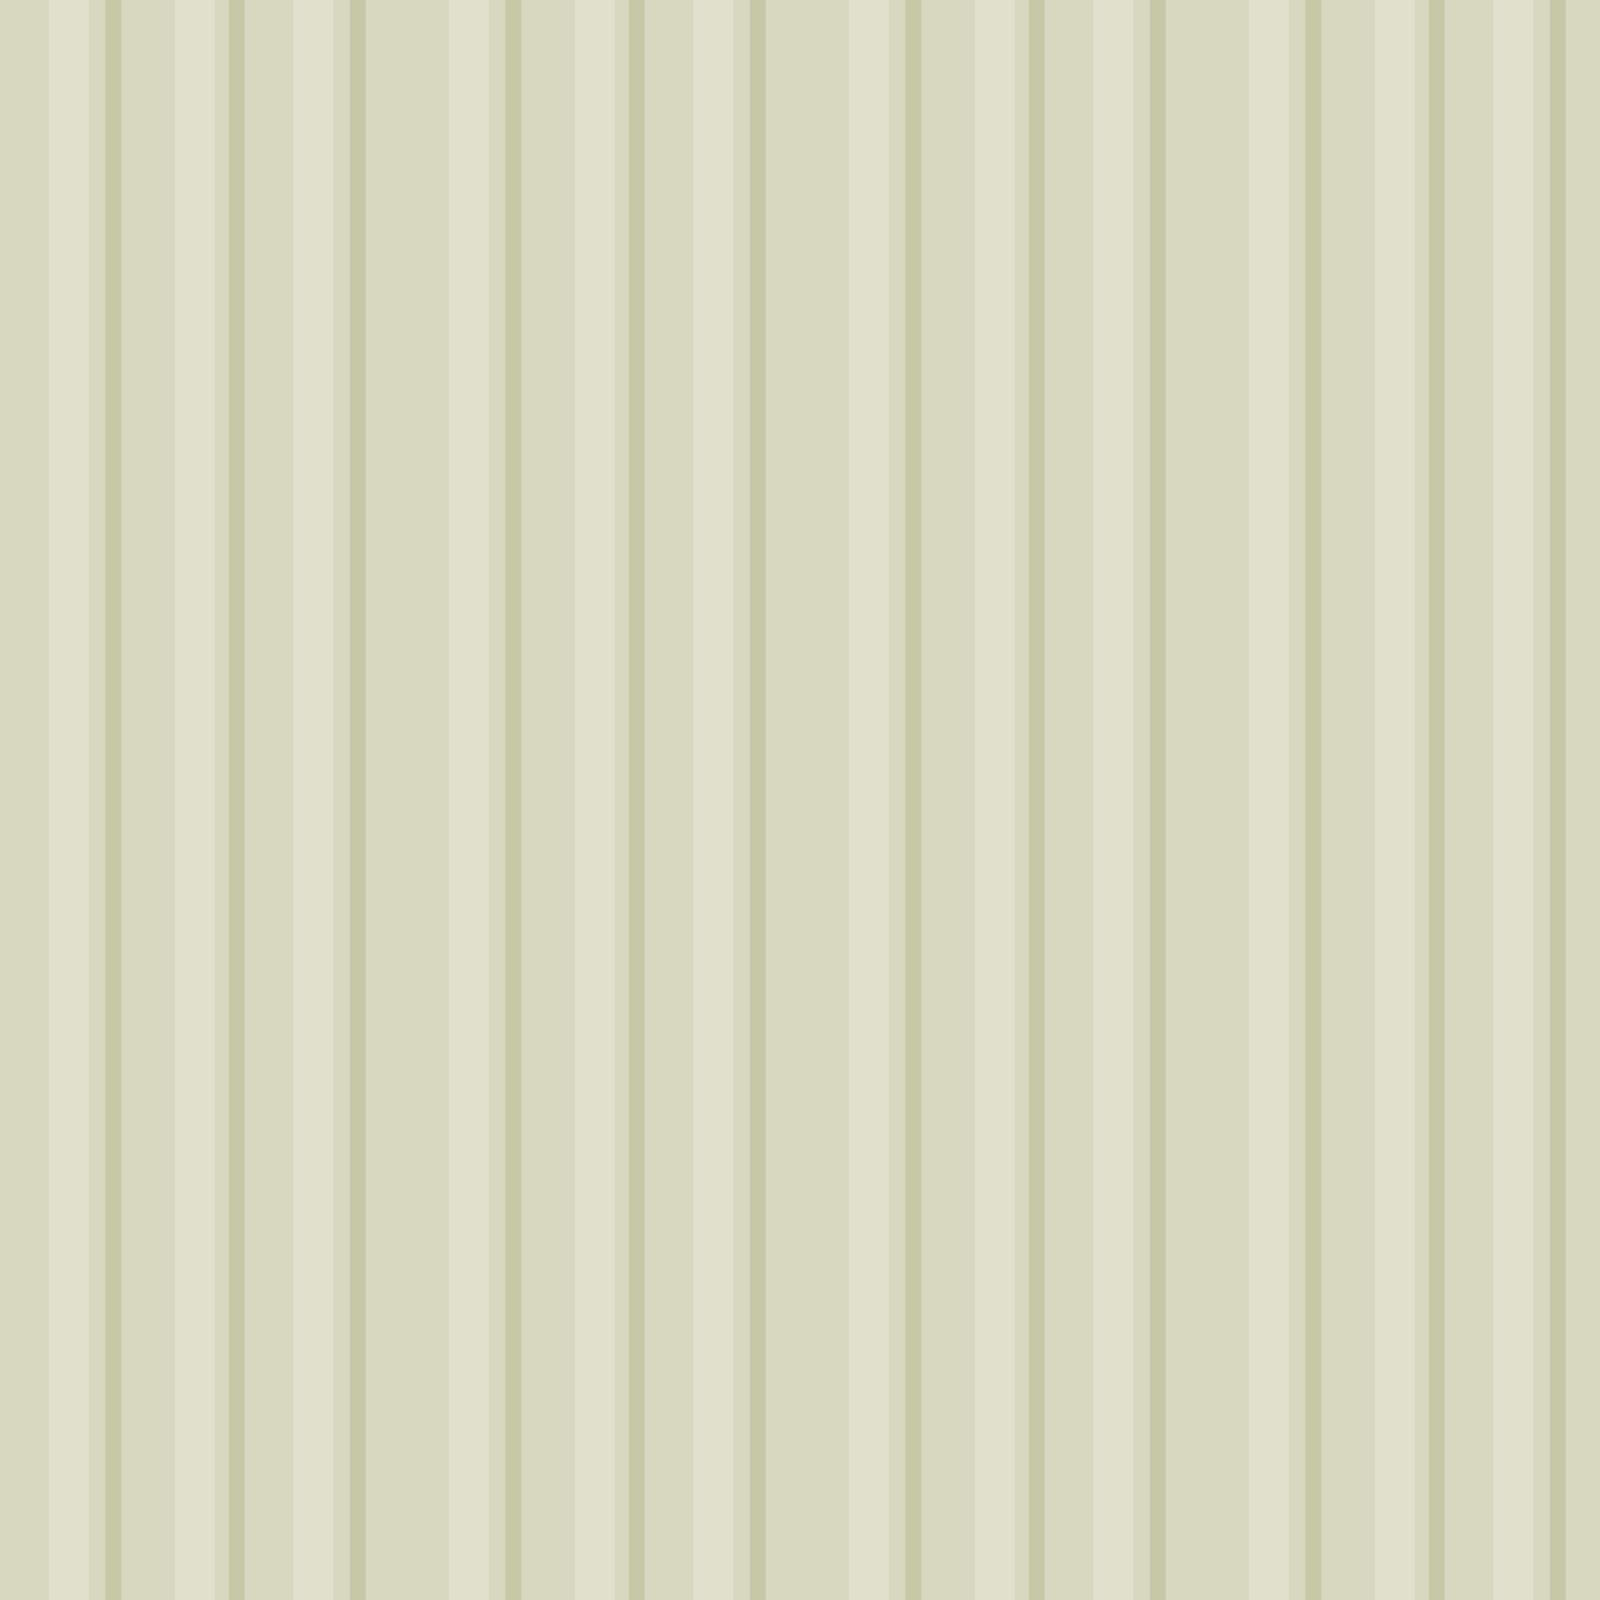 Recursos infantiles fondos de rayas verticales rosa - Papel de pared de rayas ...